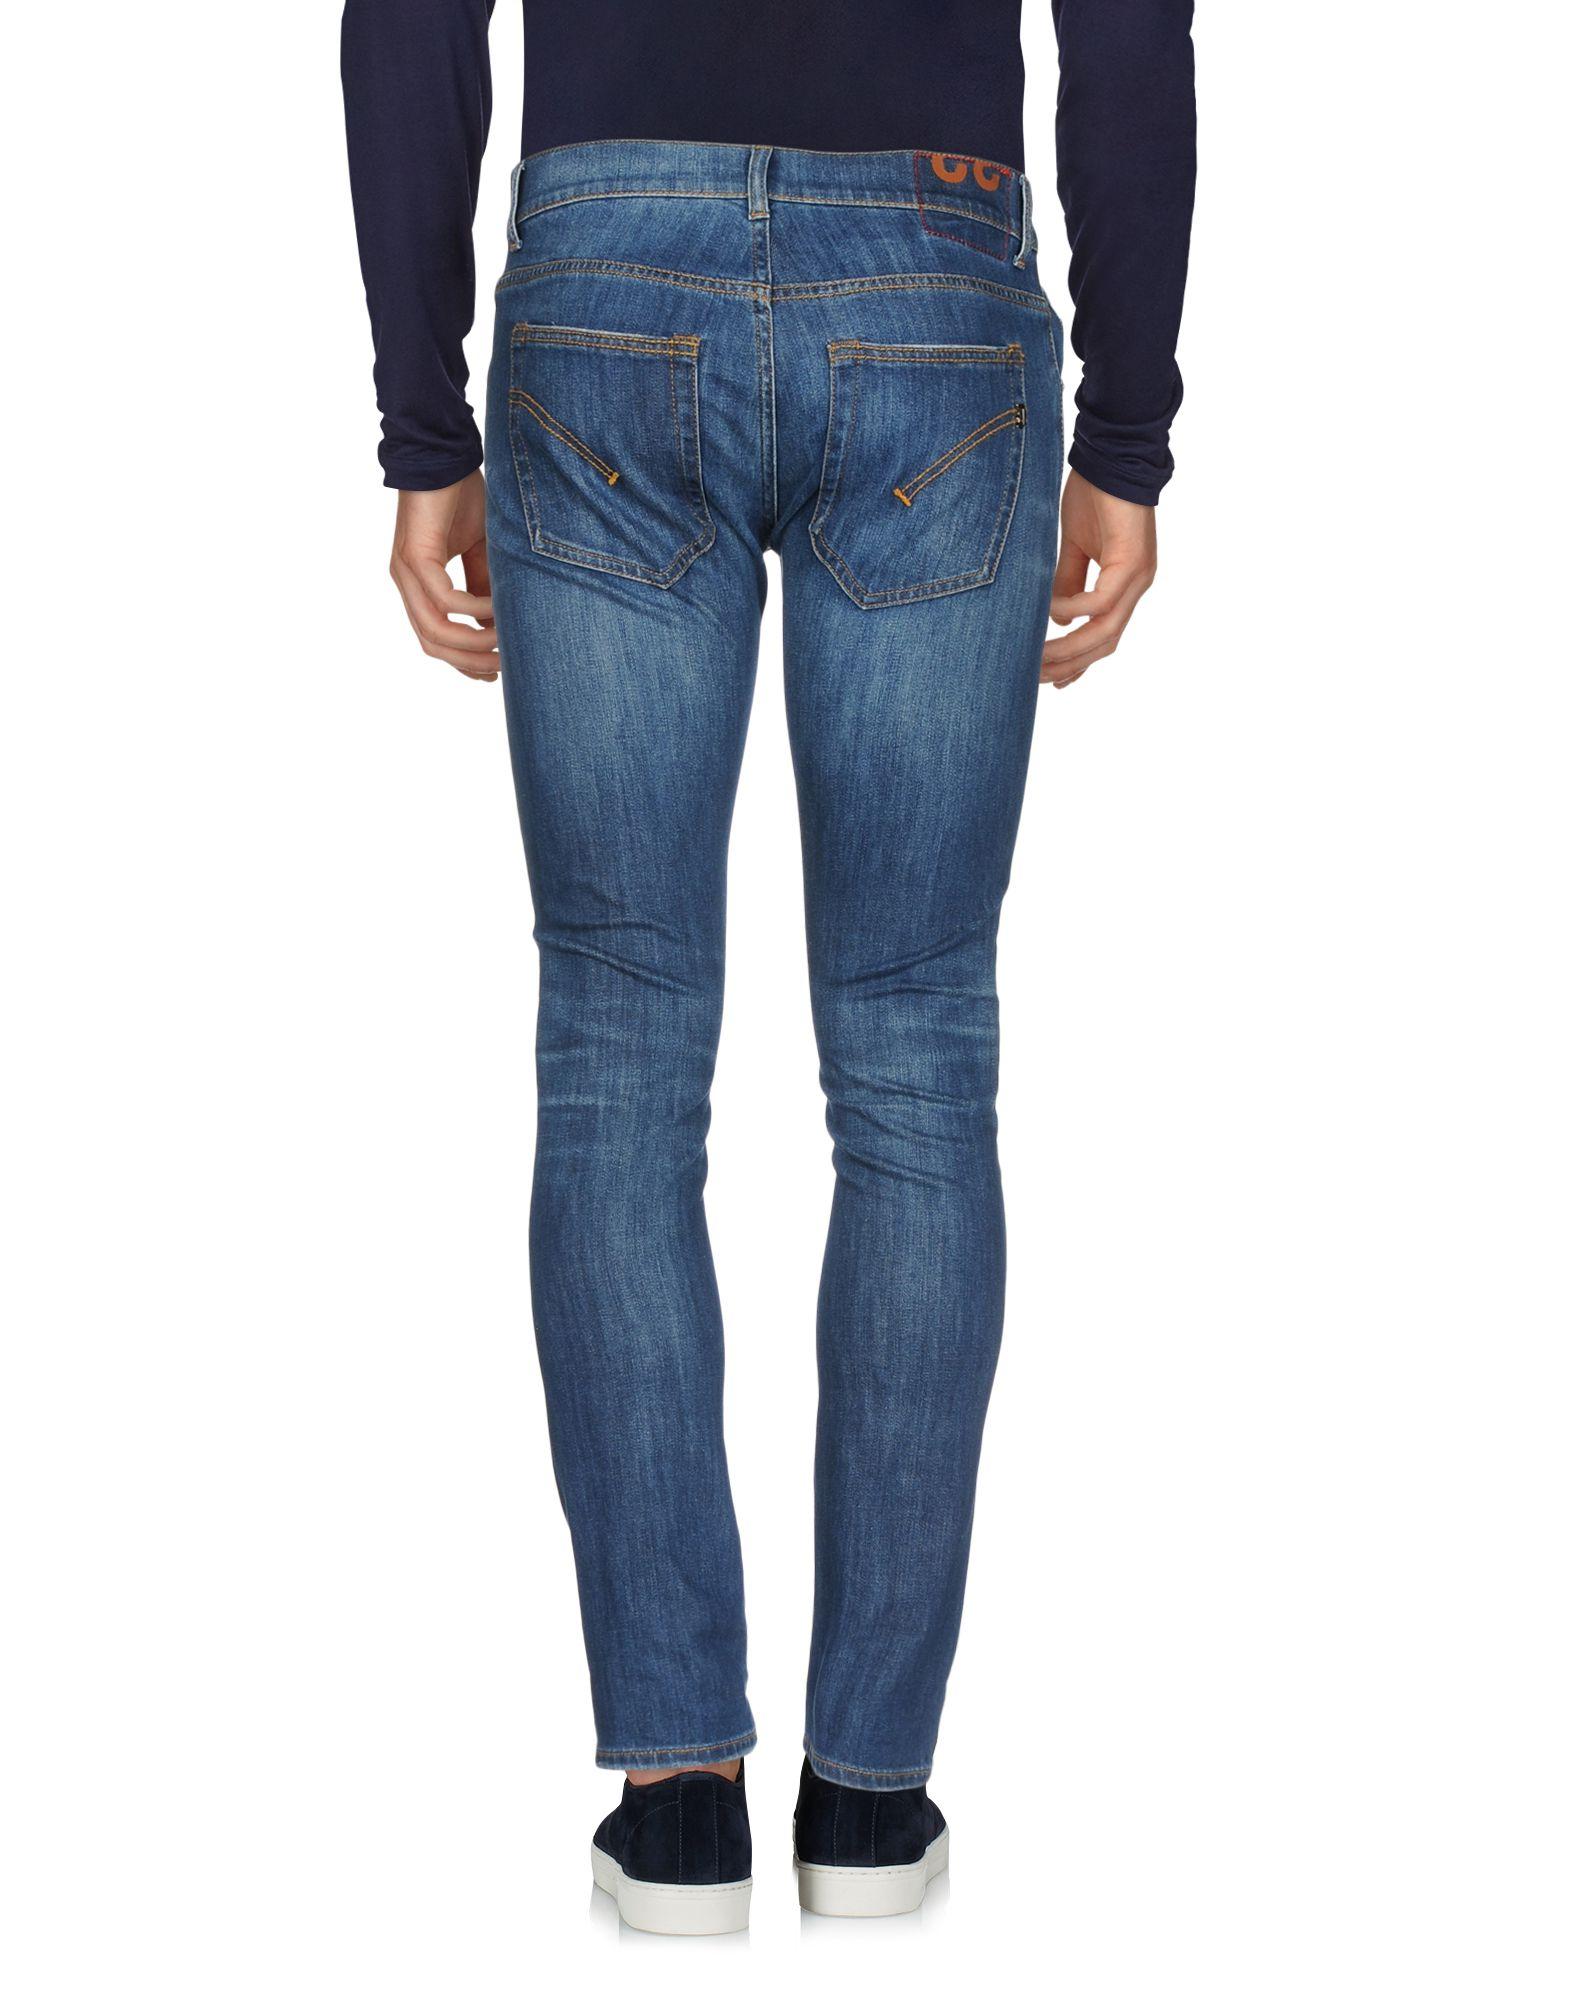 Pantaloni 42672611IN Jeans Dondup Uomo - 42672611IN Pantaloni 4b9799